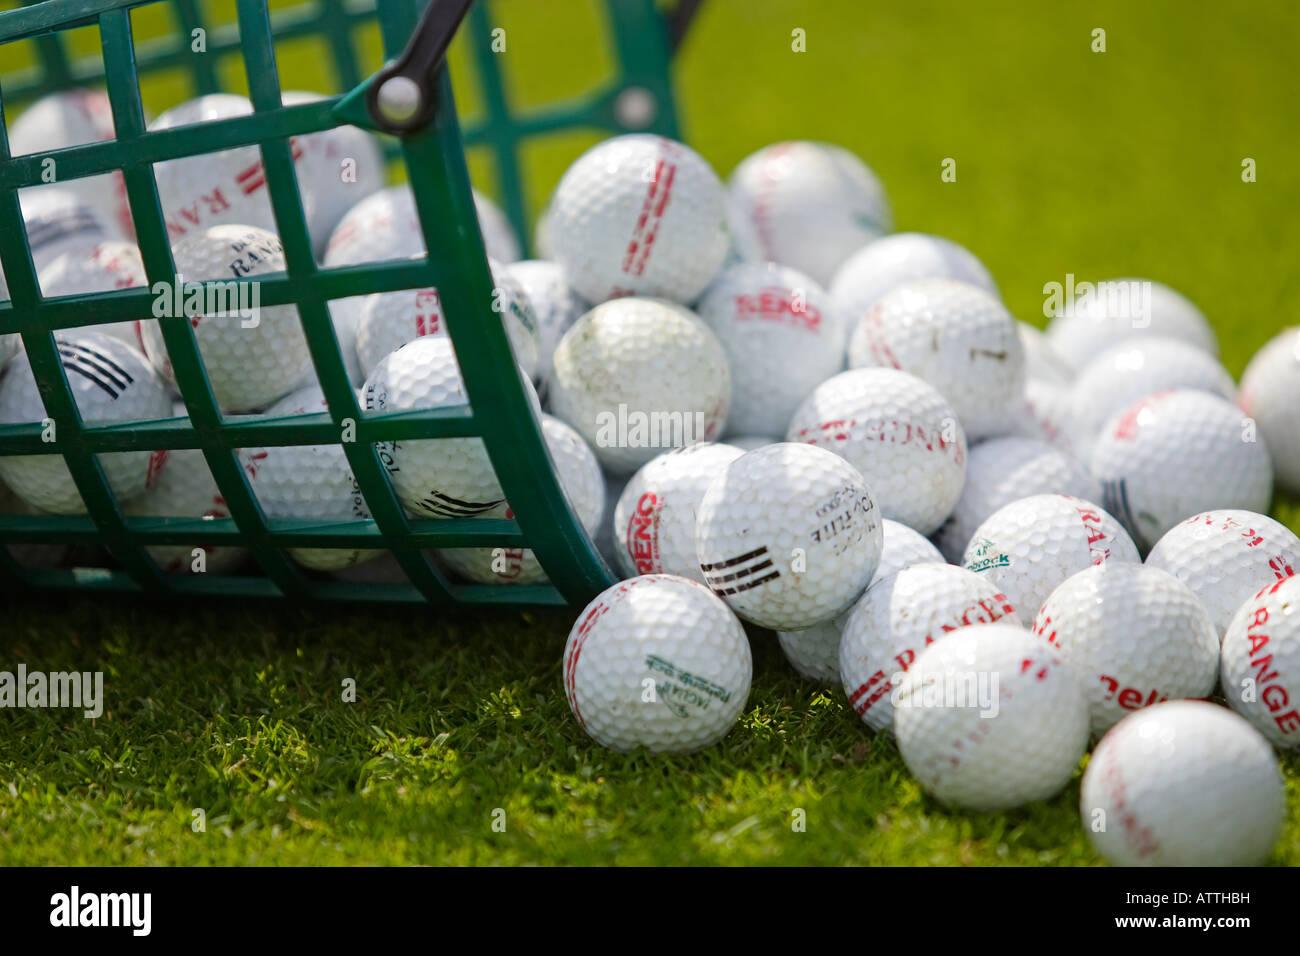 golf balls basket stock photos golf balls basket stock images alamy rh alamy com Bucket of Golf Balls Golf Theme Wrapping Basket